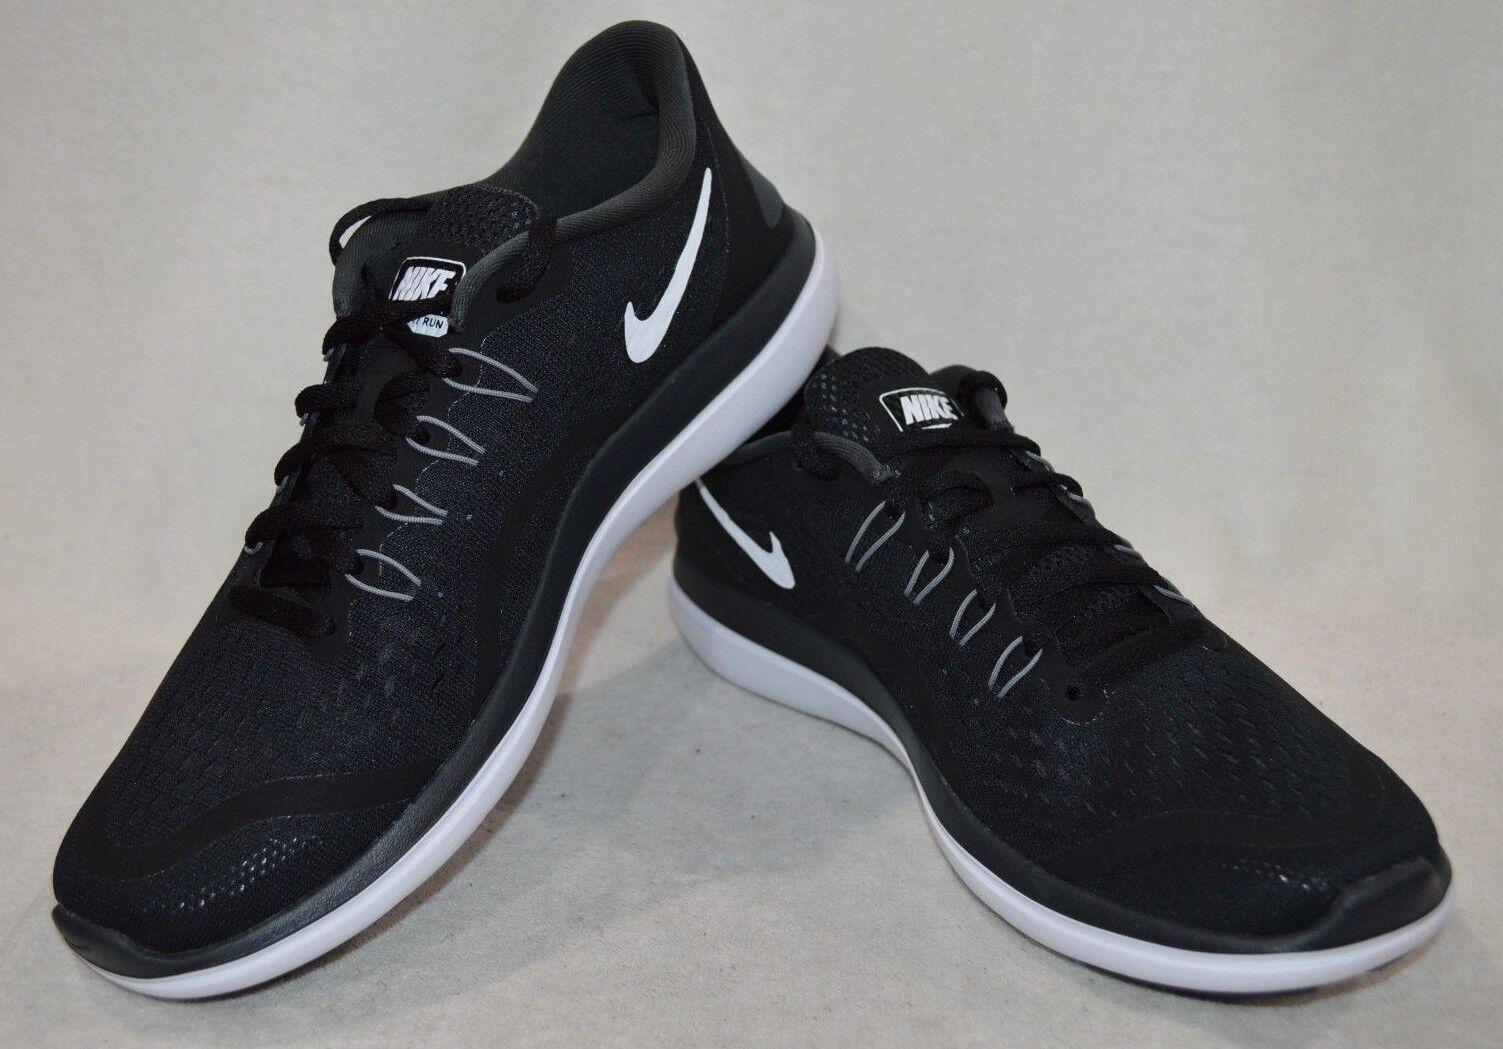 Nike maschile nero / bianco bianco bianco / flex 2017 rn antracite scarpe da corsa varie taglie nwb 6c3e99